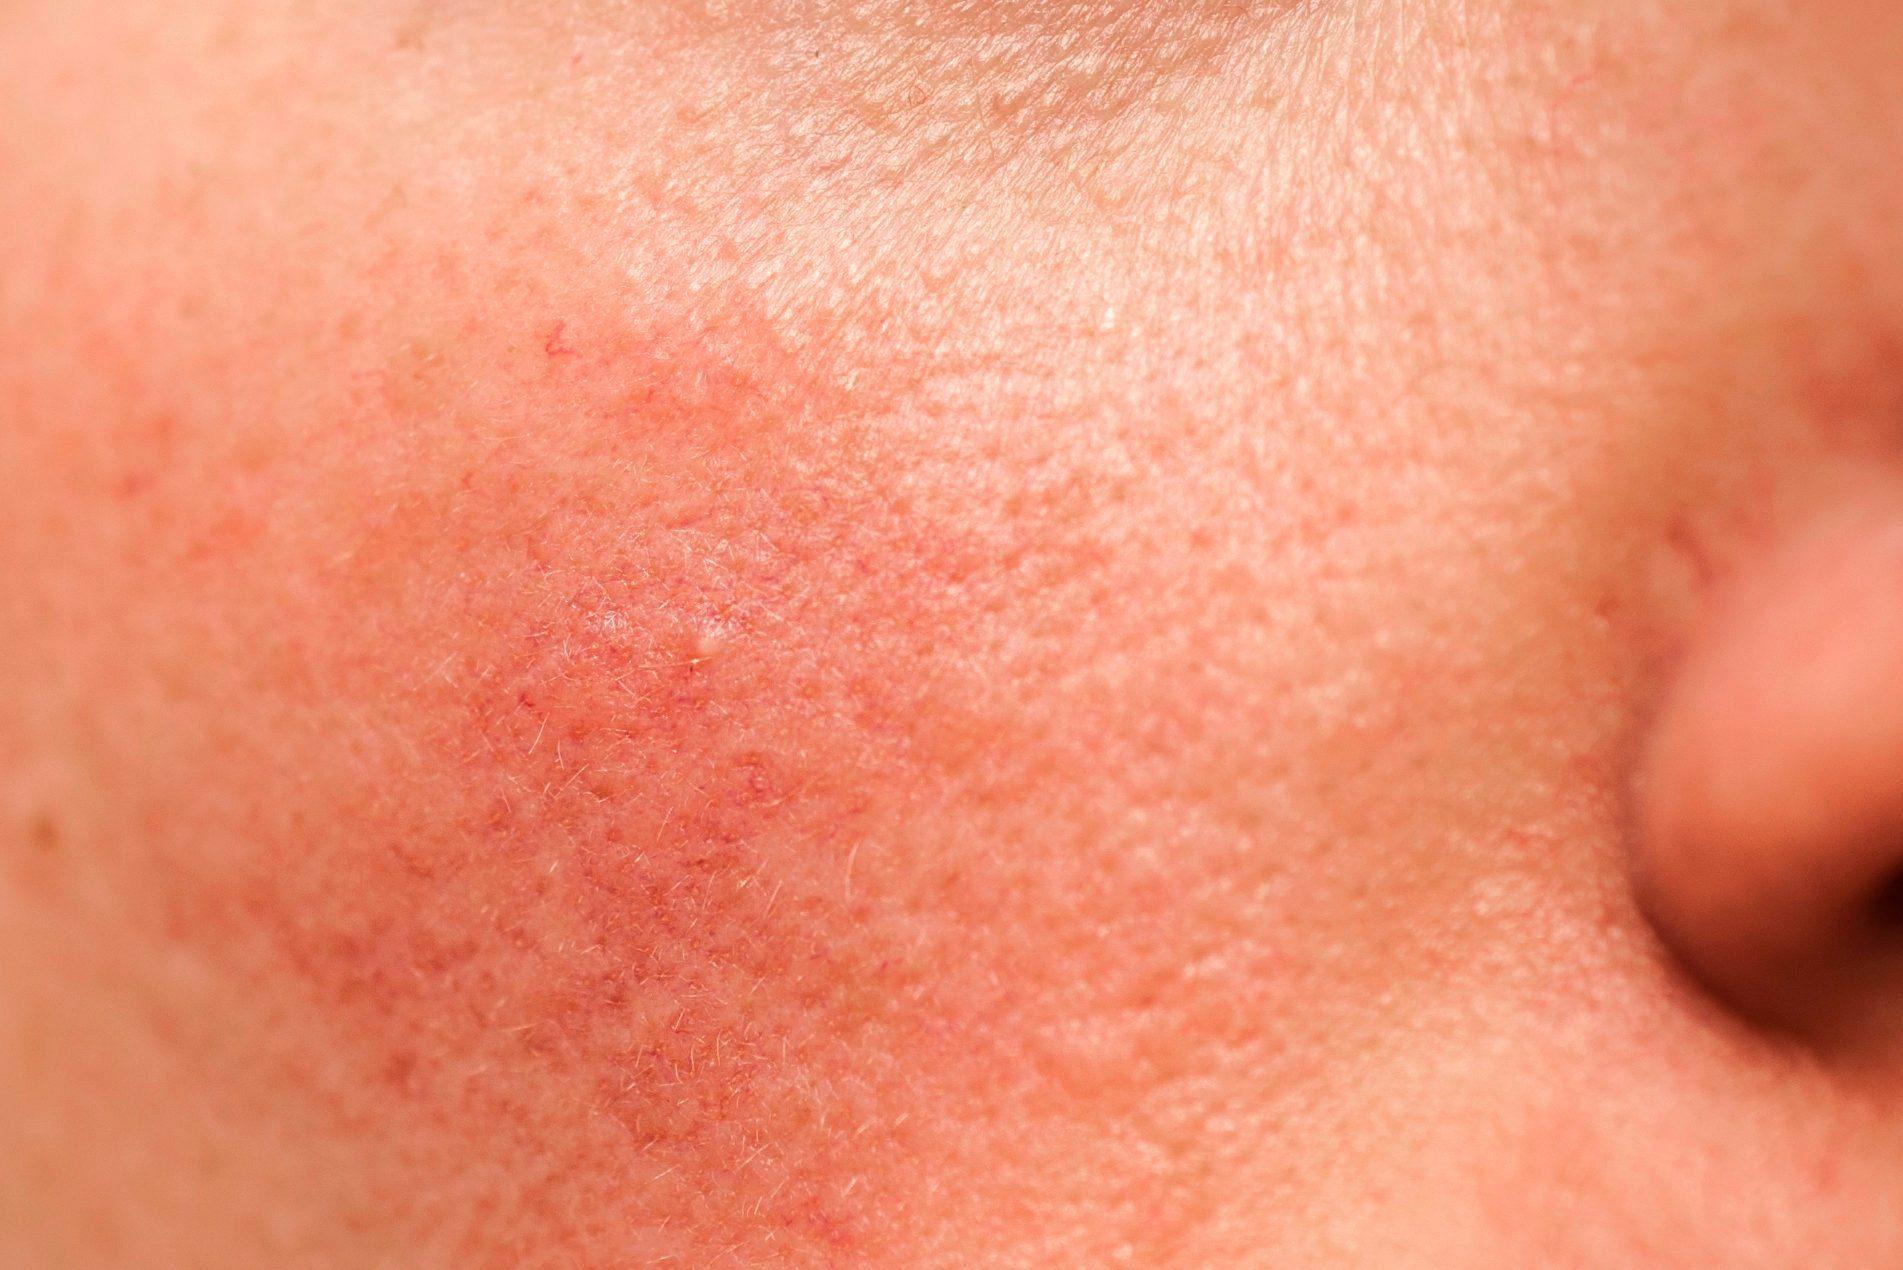 rosacea on face